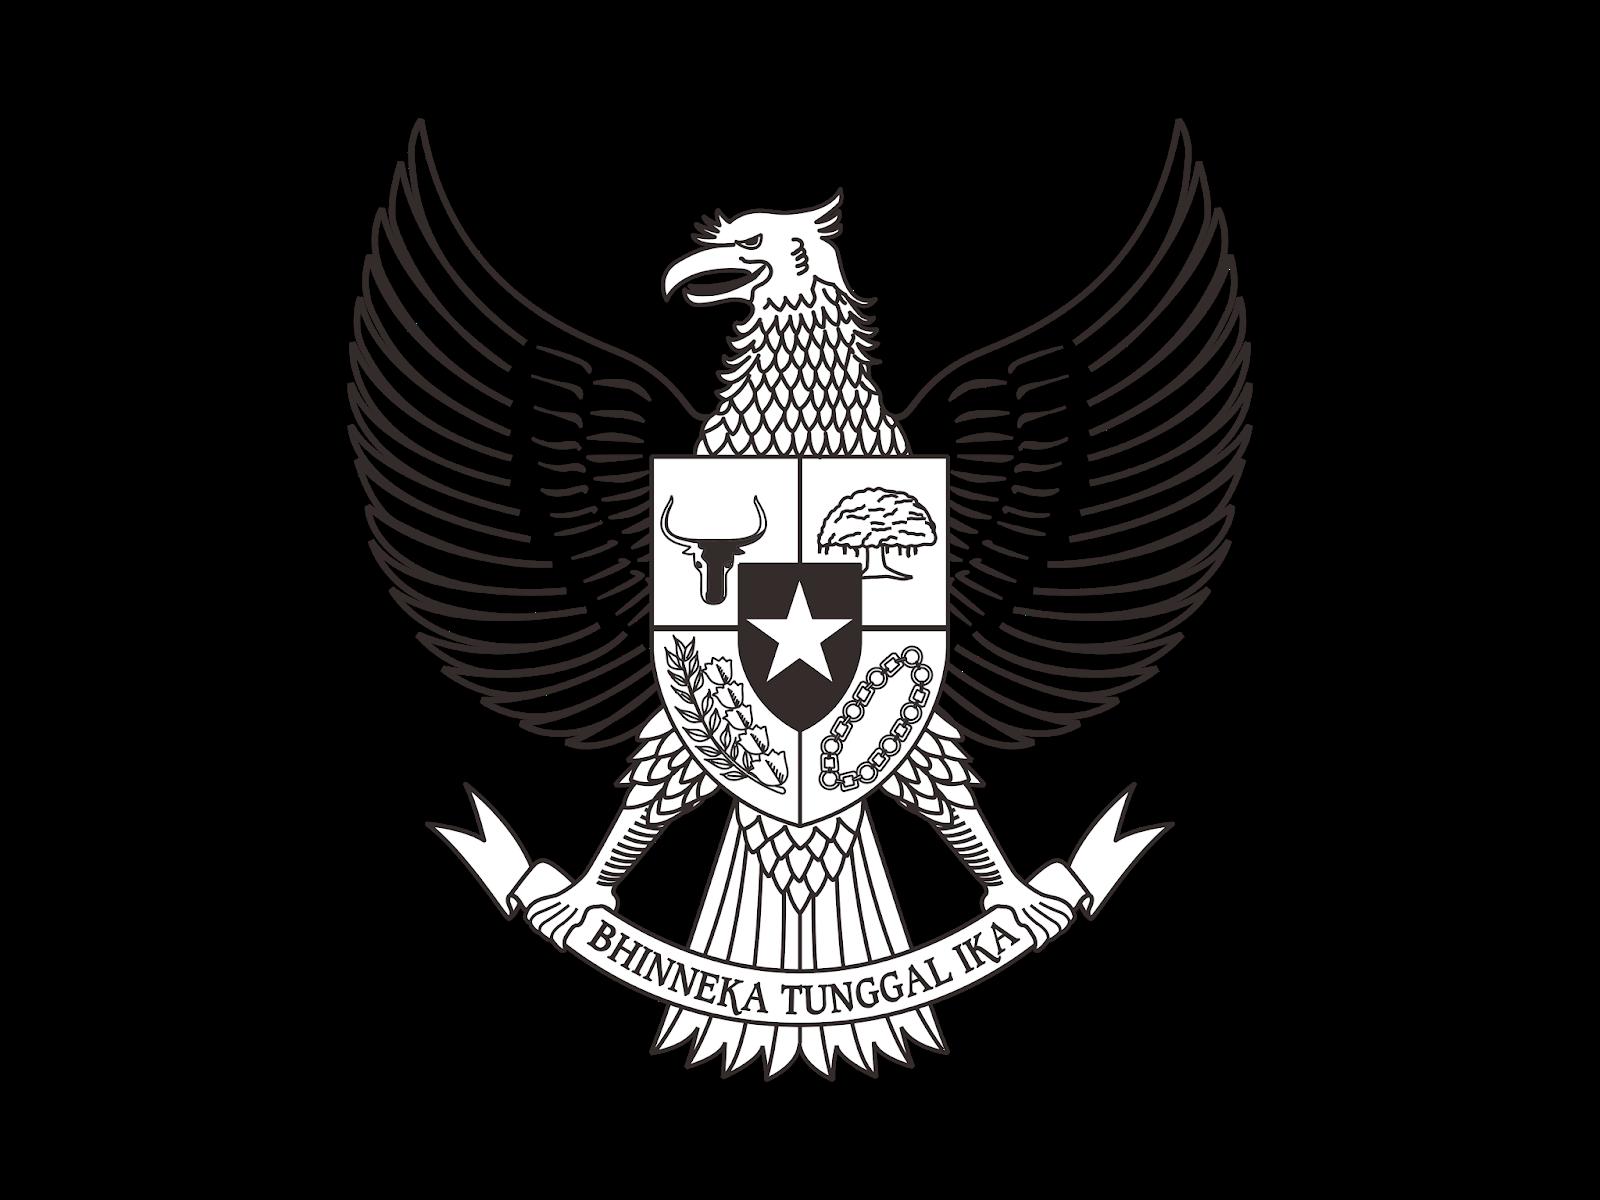 Logo Pancasila Hitam Putih Vector Cdr Png Hd Biologizone